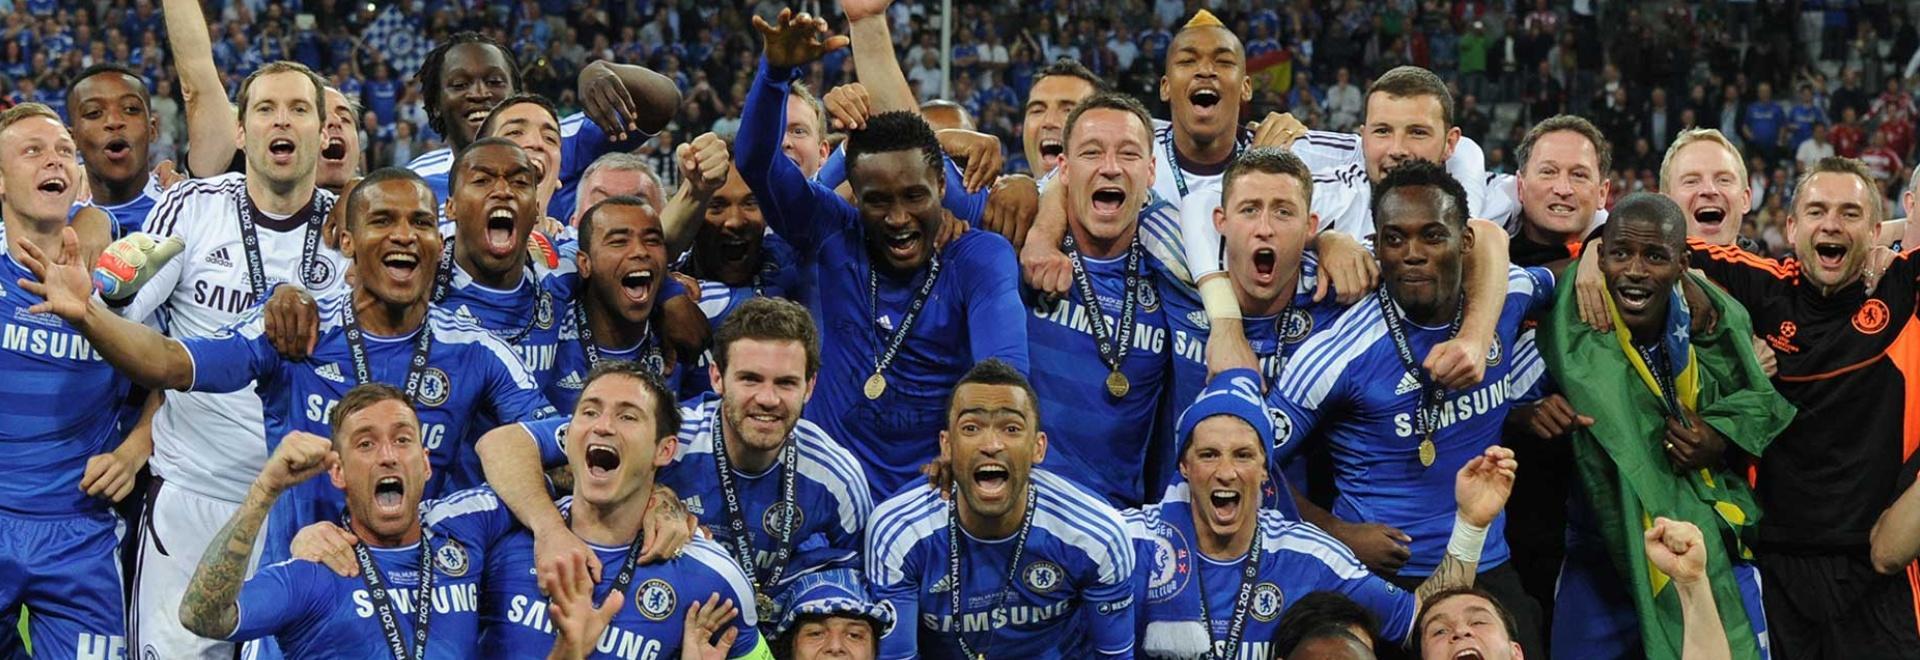 Speciale Chelsea Campione d'Europa